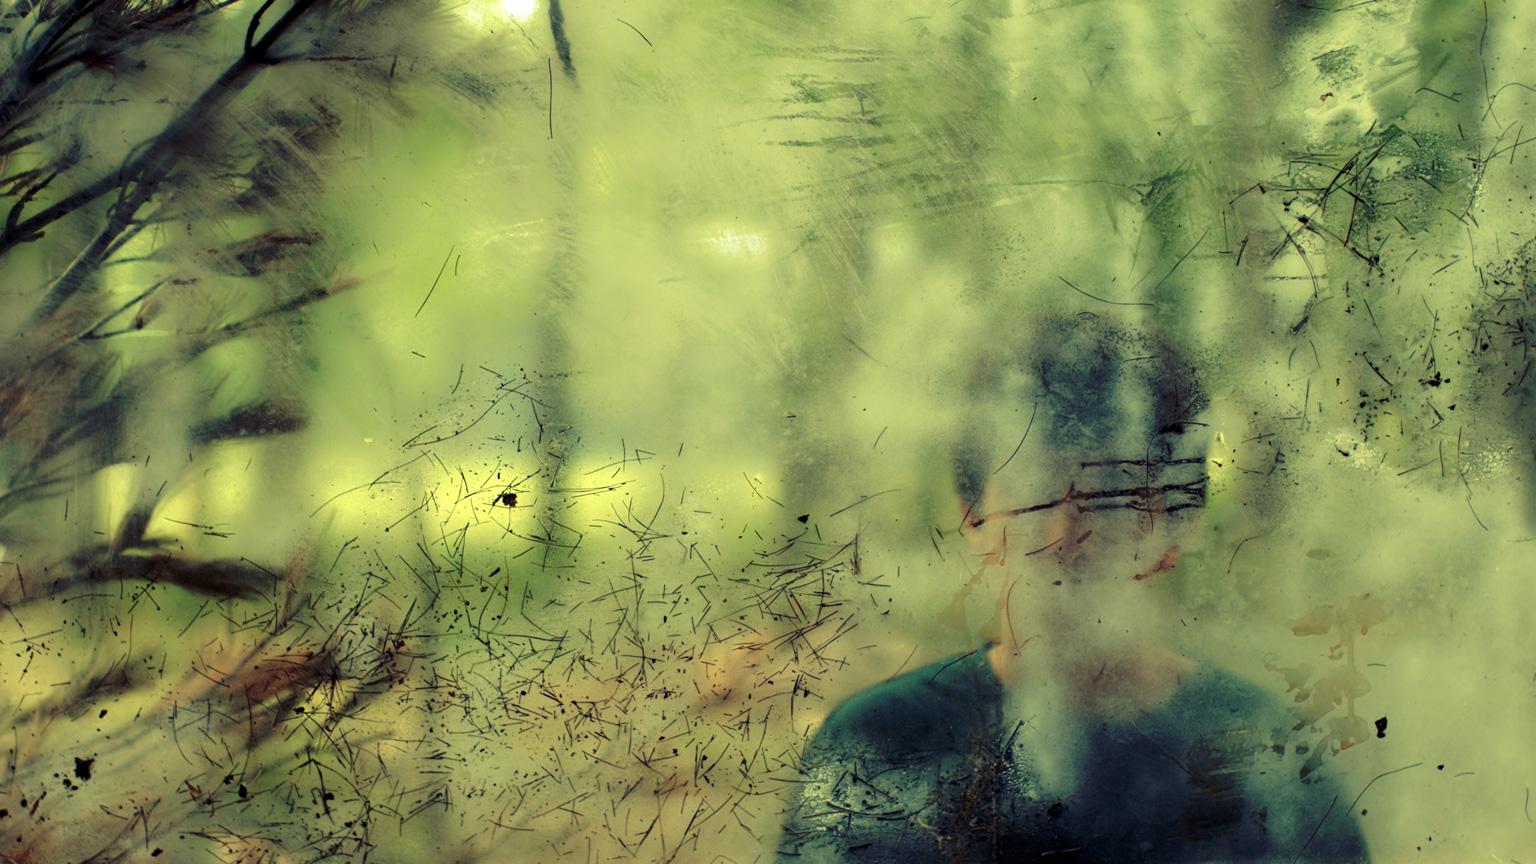 Conspiracy of Silence, Window 1 #100, 2009, C-Print